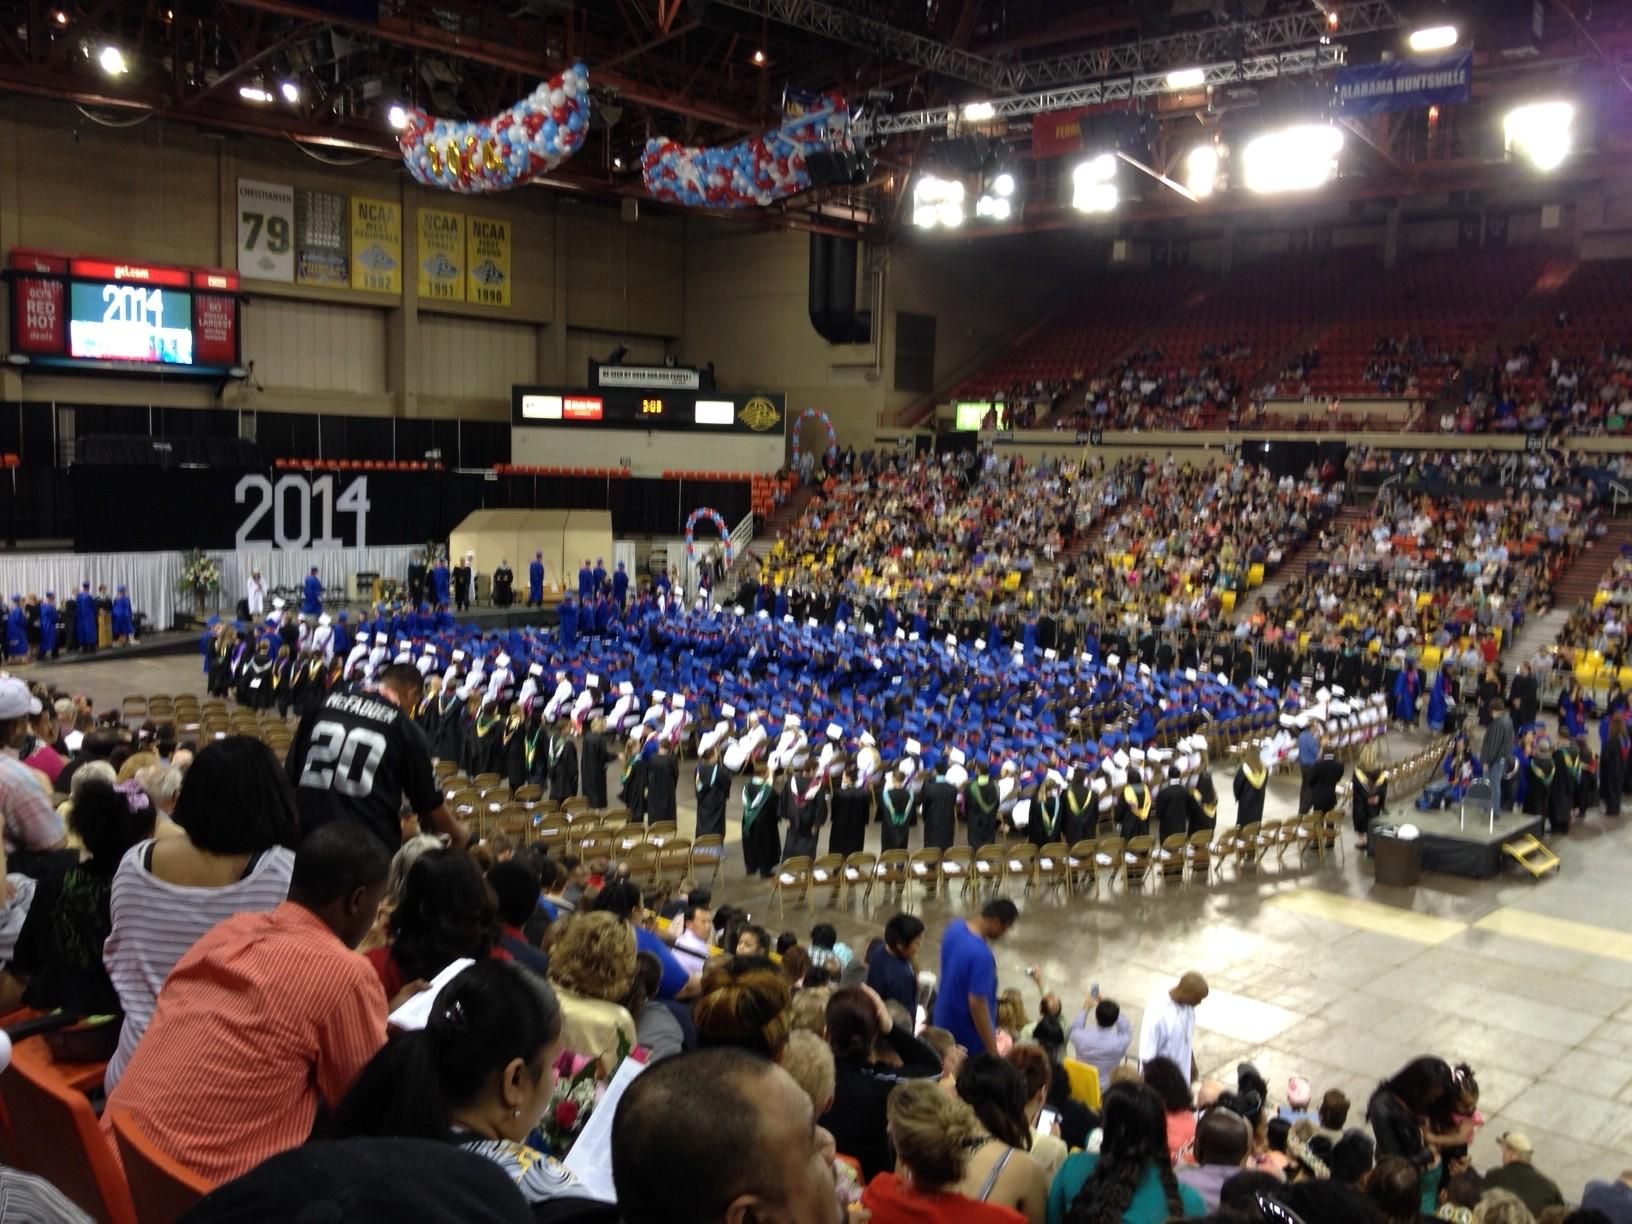 Students wait to receive their diplomas at Sullivan Arena (Photo by Anne Hillman, Alaska Public Media - Anchorage)